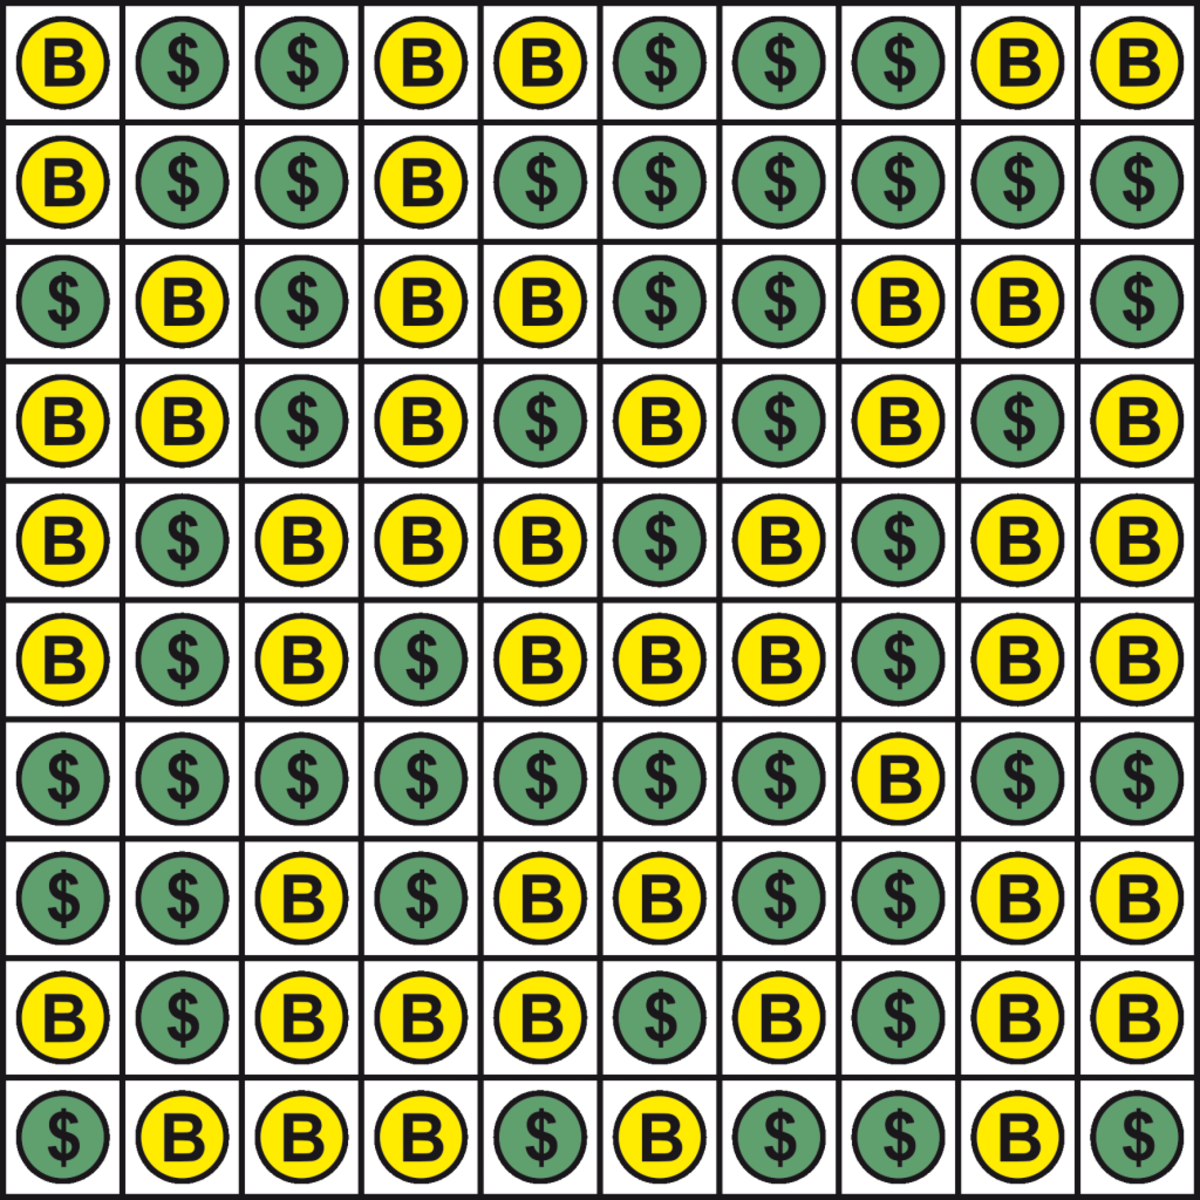 FIGURE 6: bitcoins and dollars